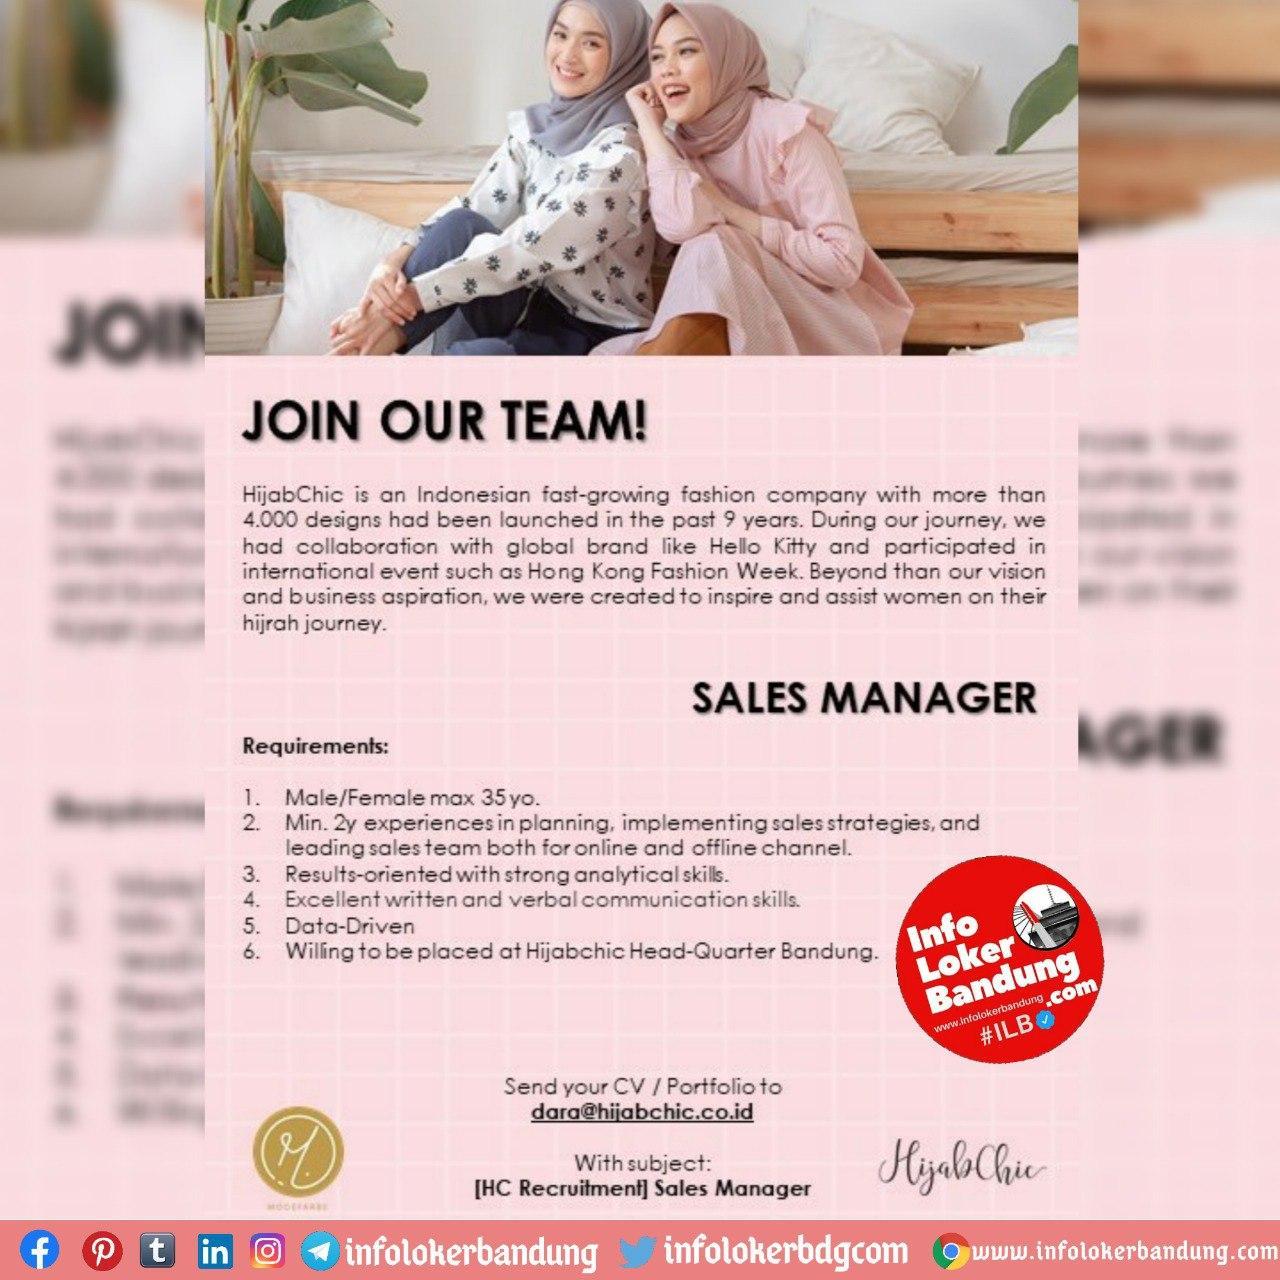 Lowongan Kerja Sales Manager & Online Sales Associate Hijab Chick Bandung Oktober 2020